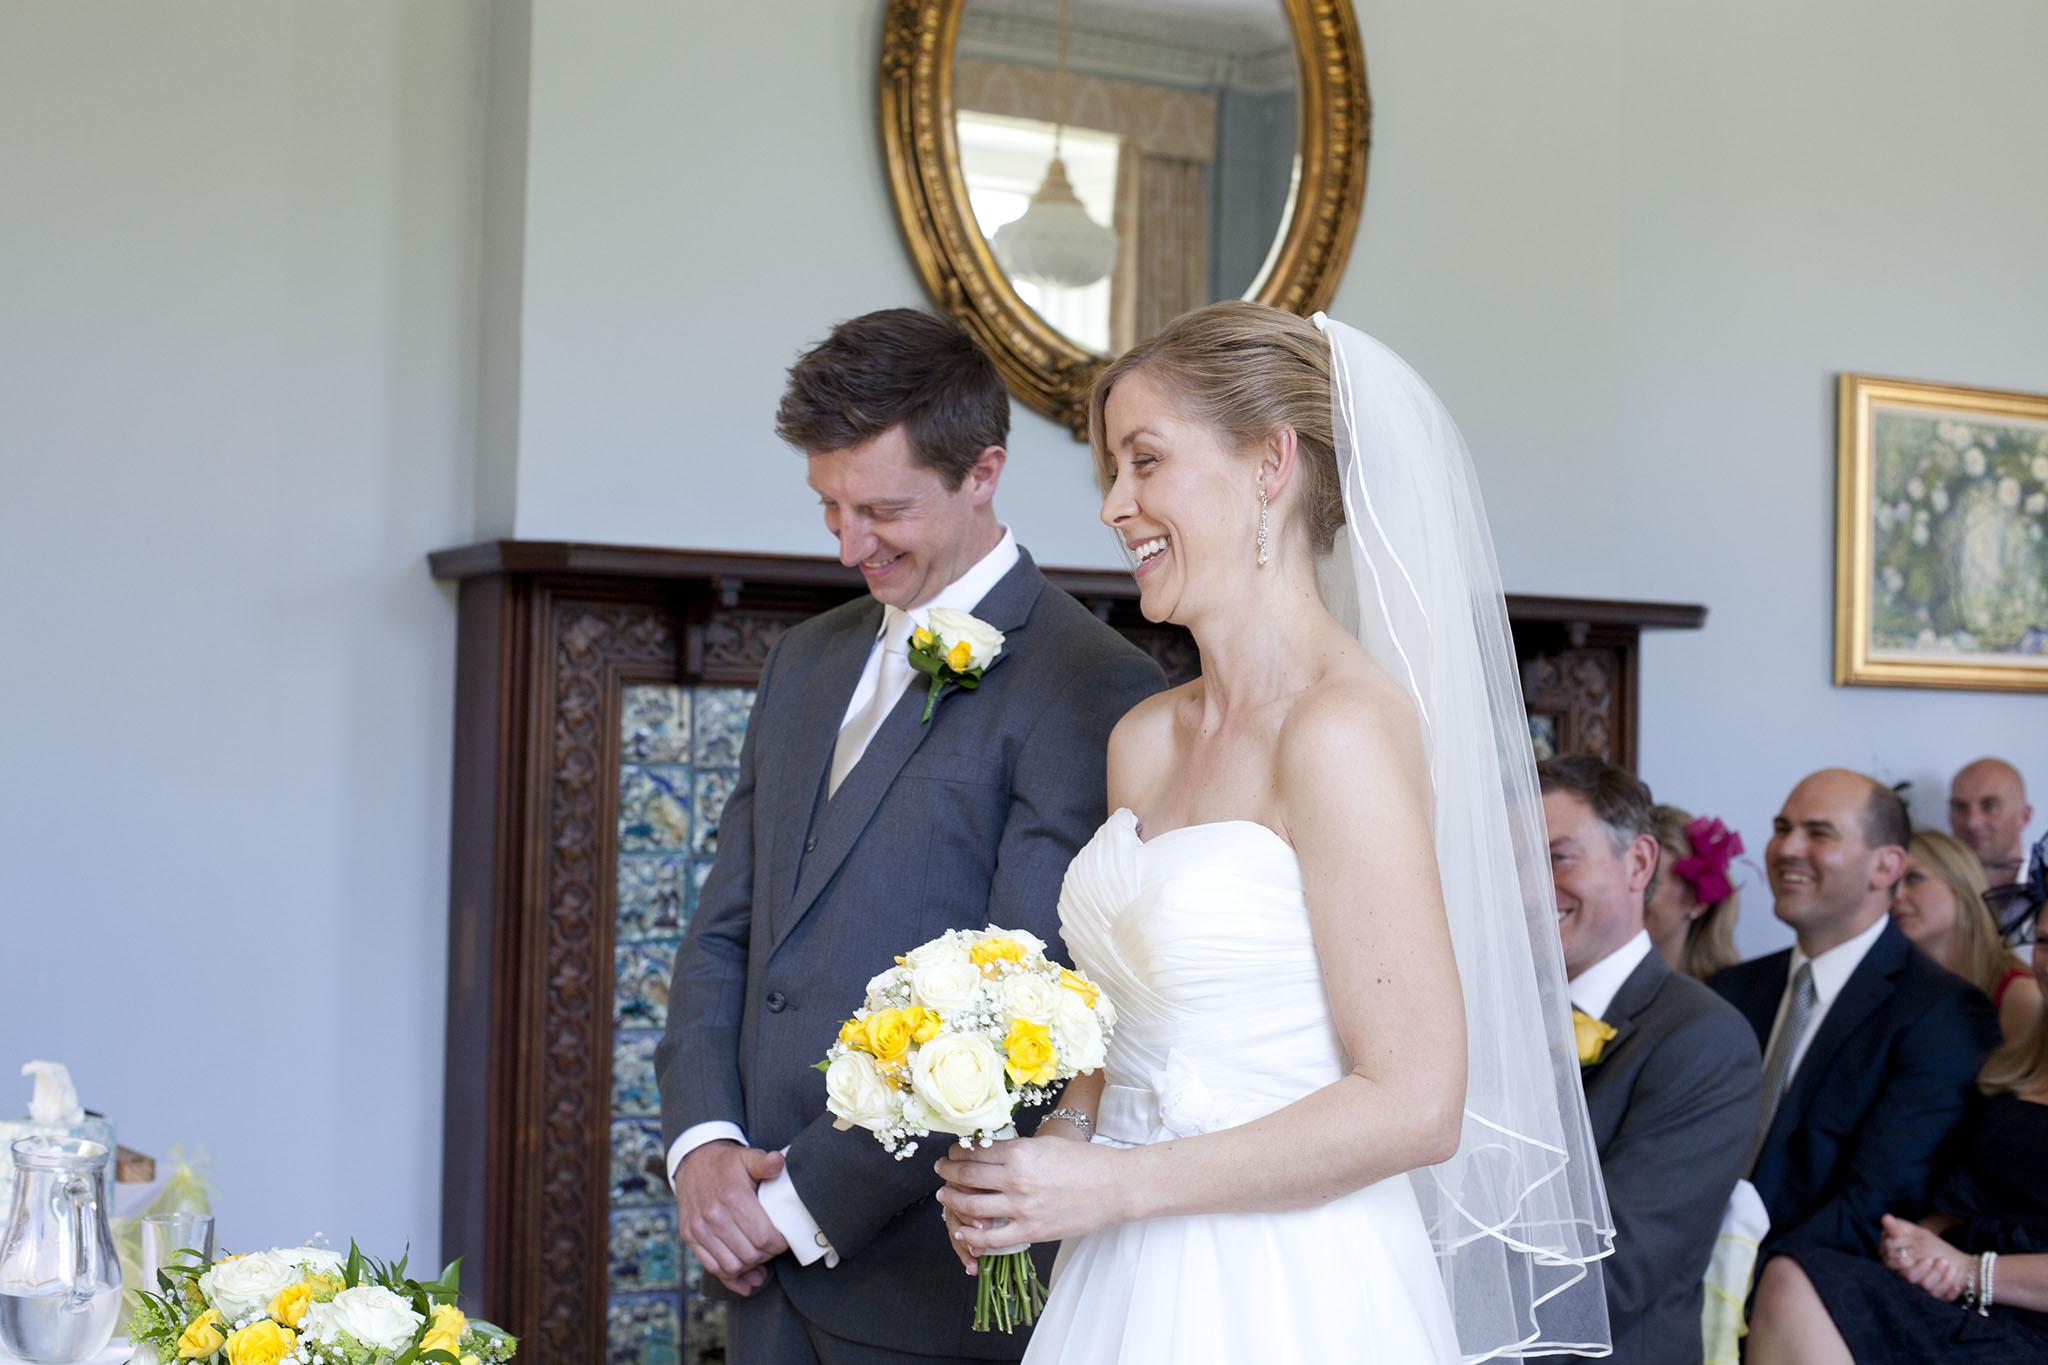 elizabethg_fineart_photography_hertfordshire_rachel_adam_wedding_highelmsmanor_22.jpg